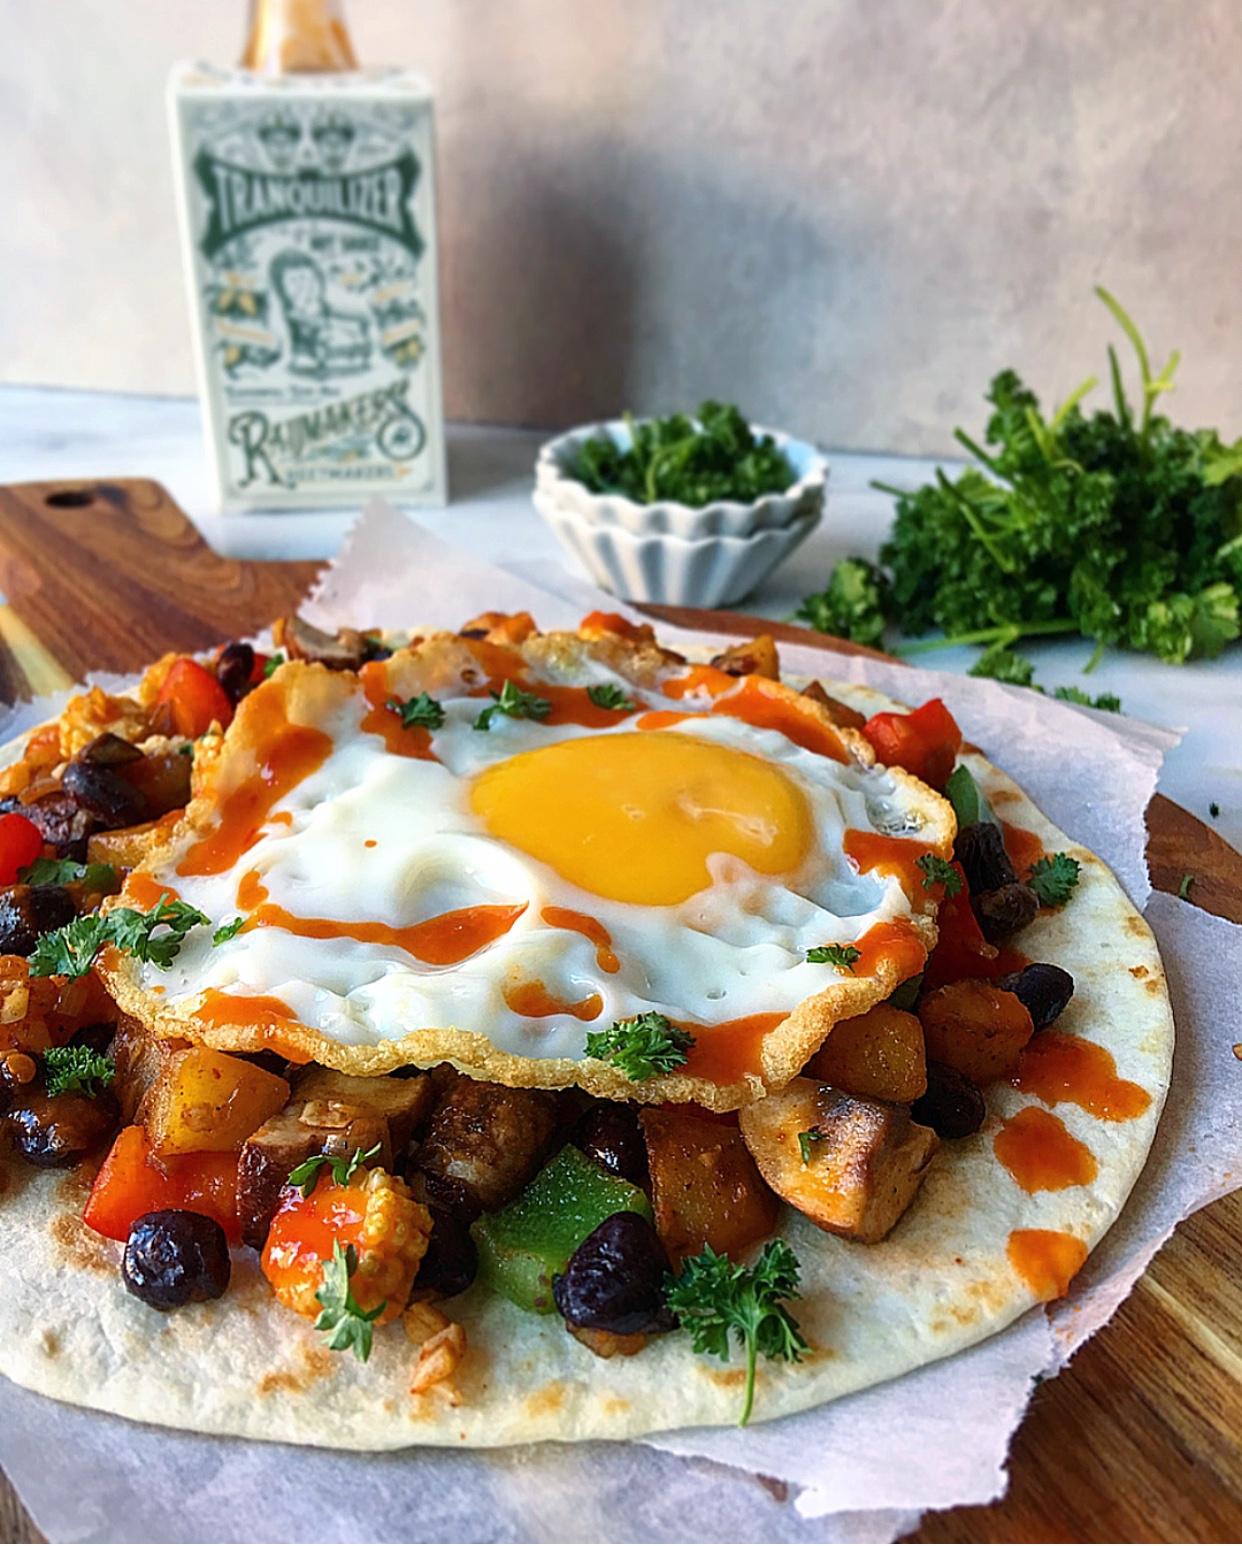 Vaderdagontbijt tip - spicy breakfast taco